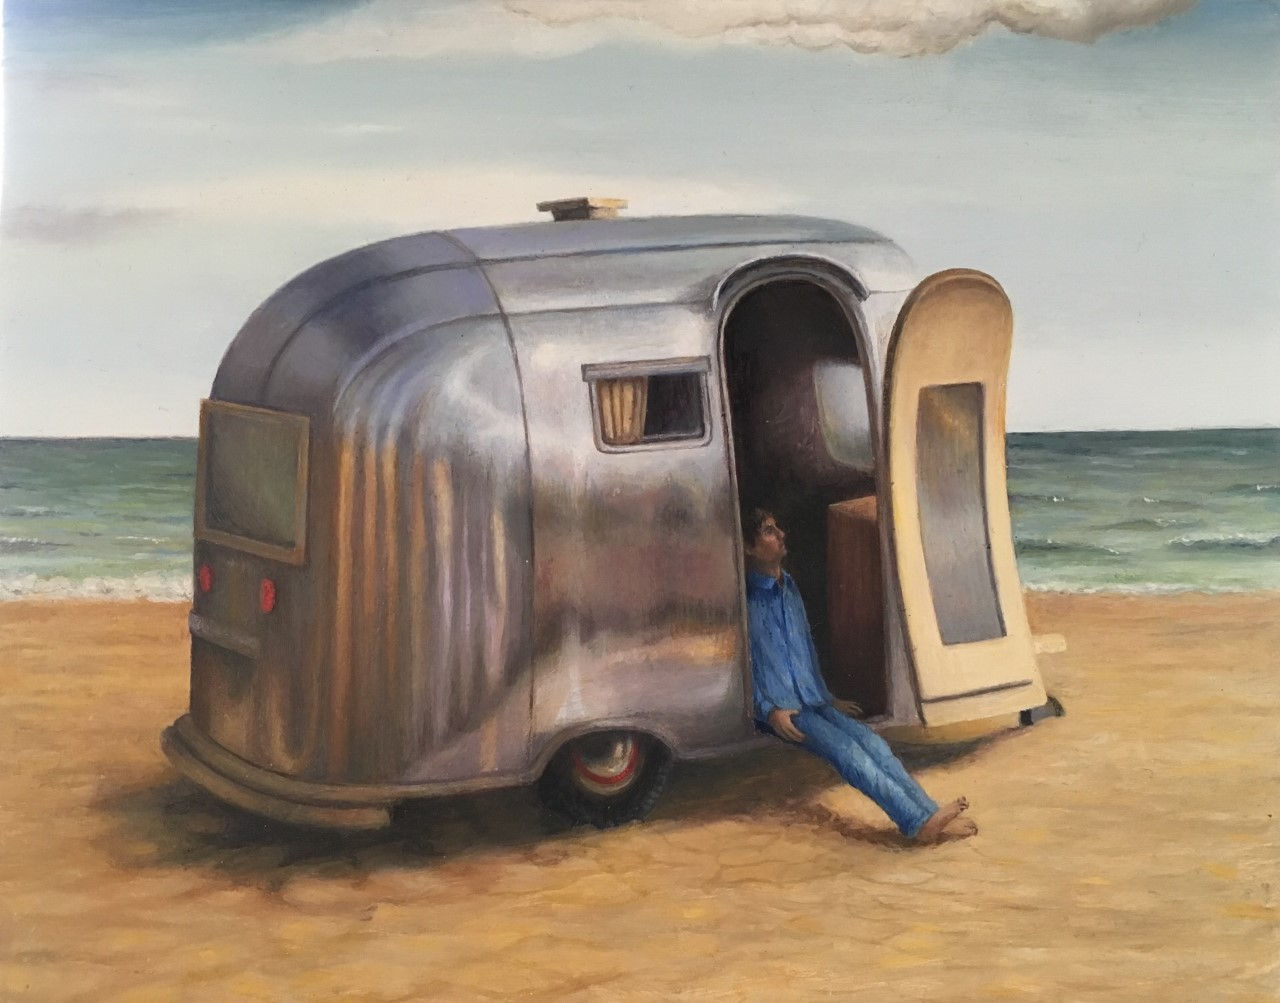 "'Beach boy', 2018, oil on gessoed panel, 5"" x 6"""